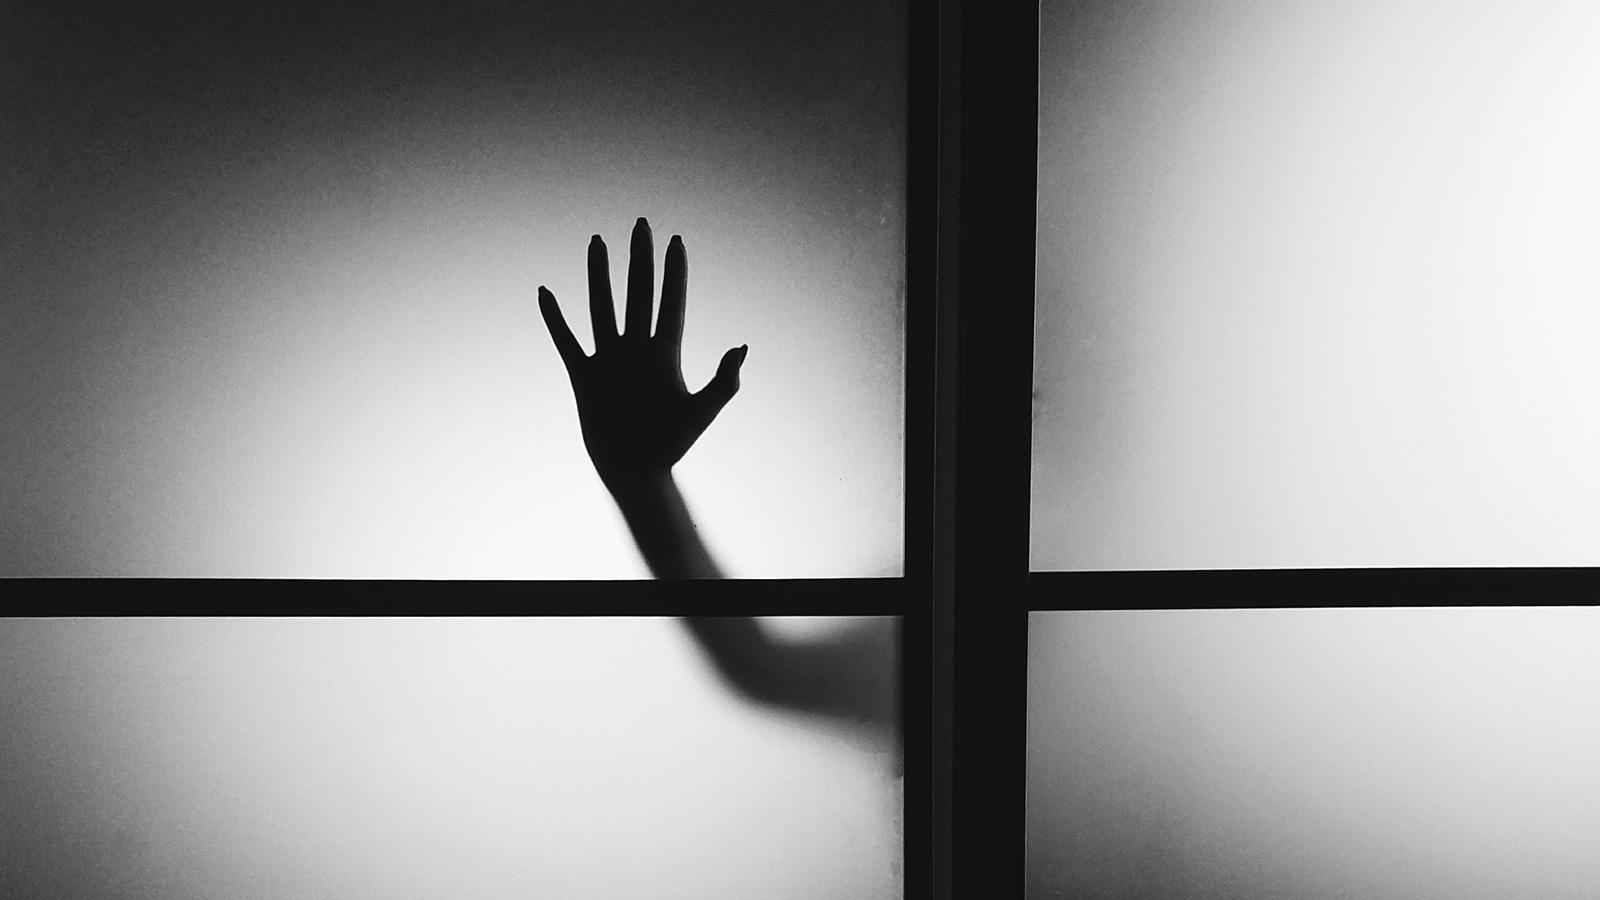 B&W hand against a glass wall